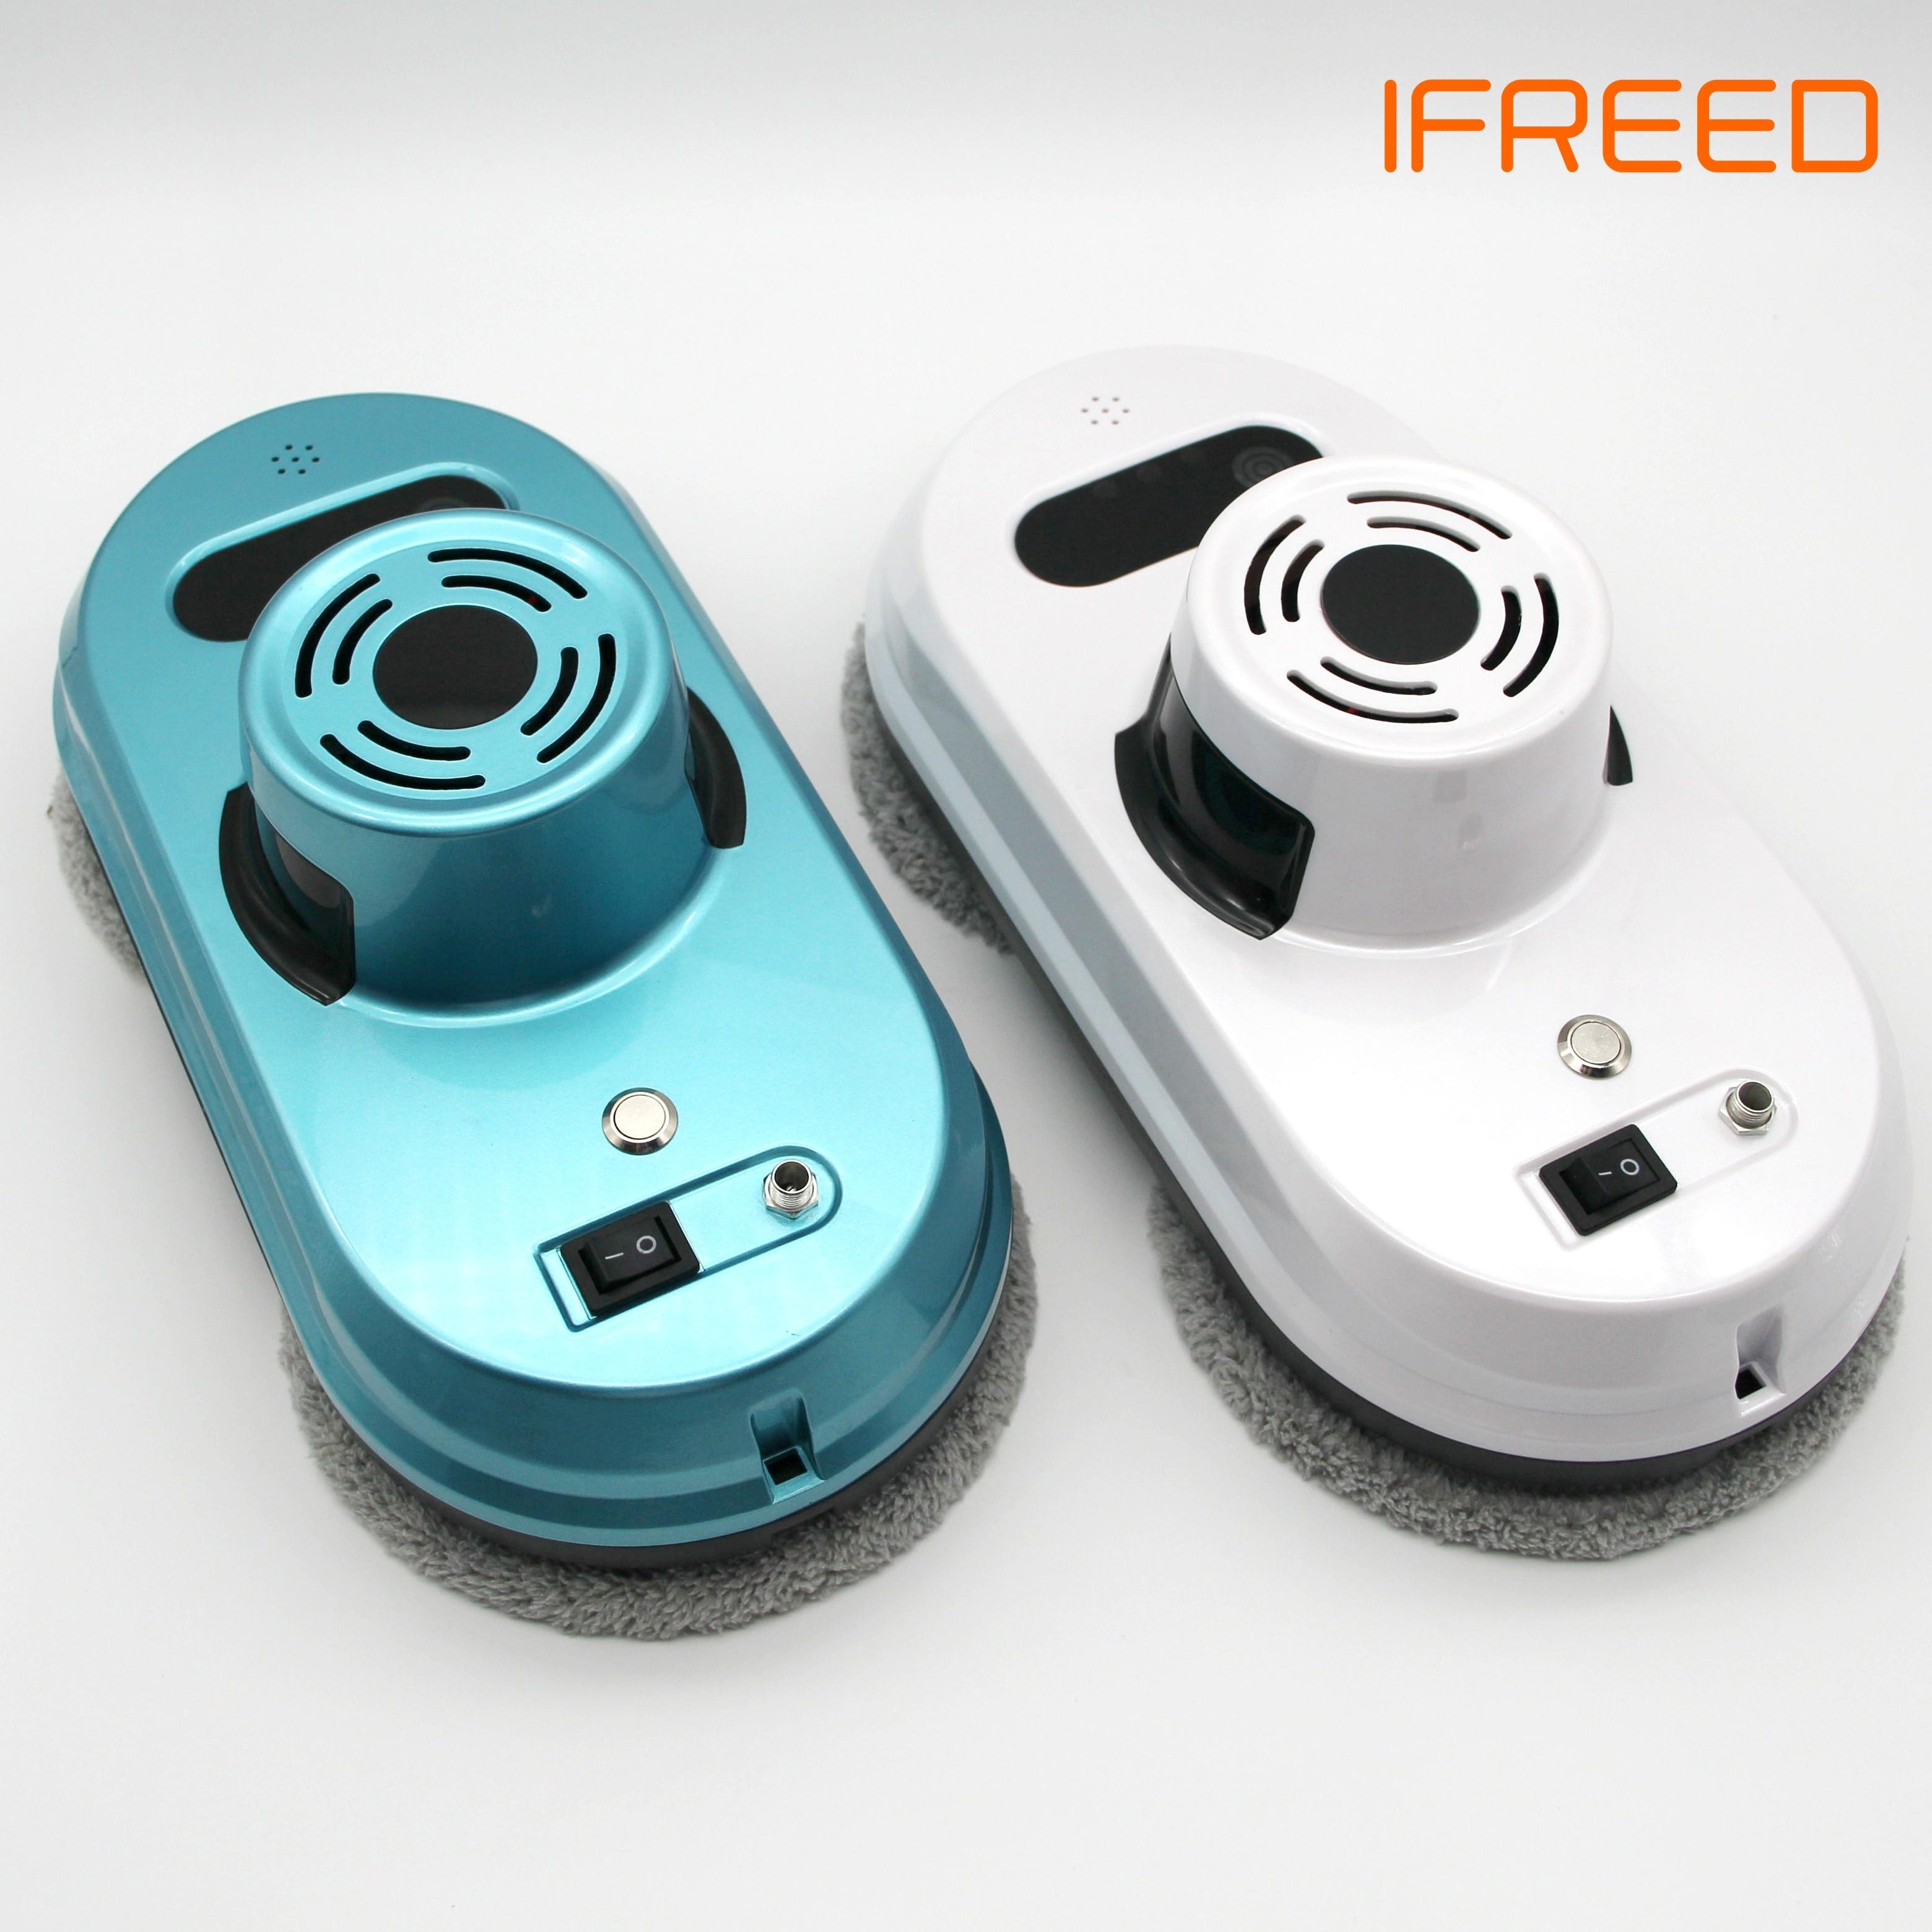 2019 Novos Modelos de Robô Aspirador de pó Robô De Limpeza De Janelas de Vidro Limpo Máquina De Lavar Vidro UE Adaptador Russa de Limpeza